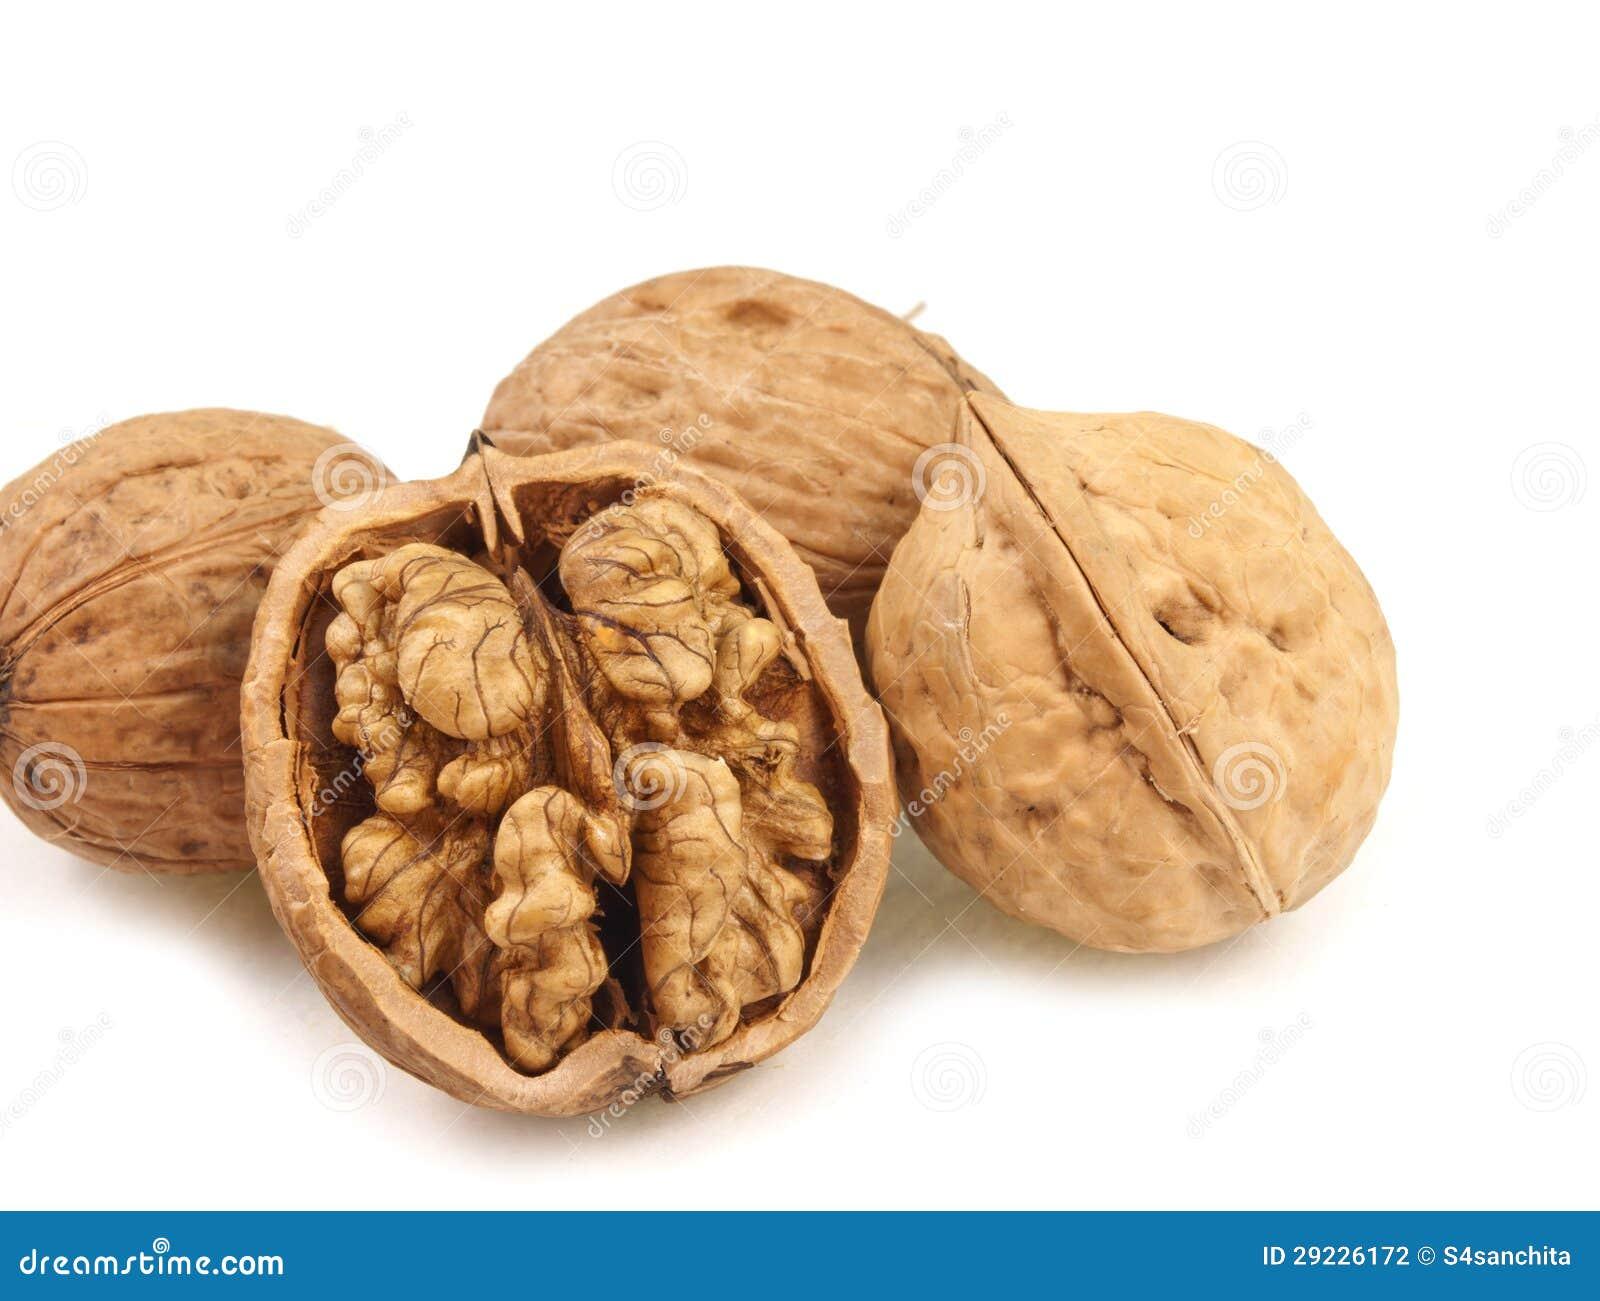 how to crack open walnut